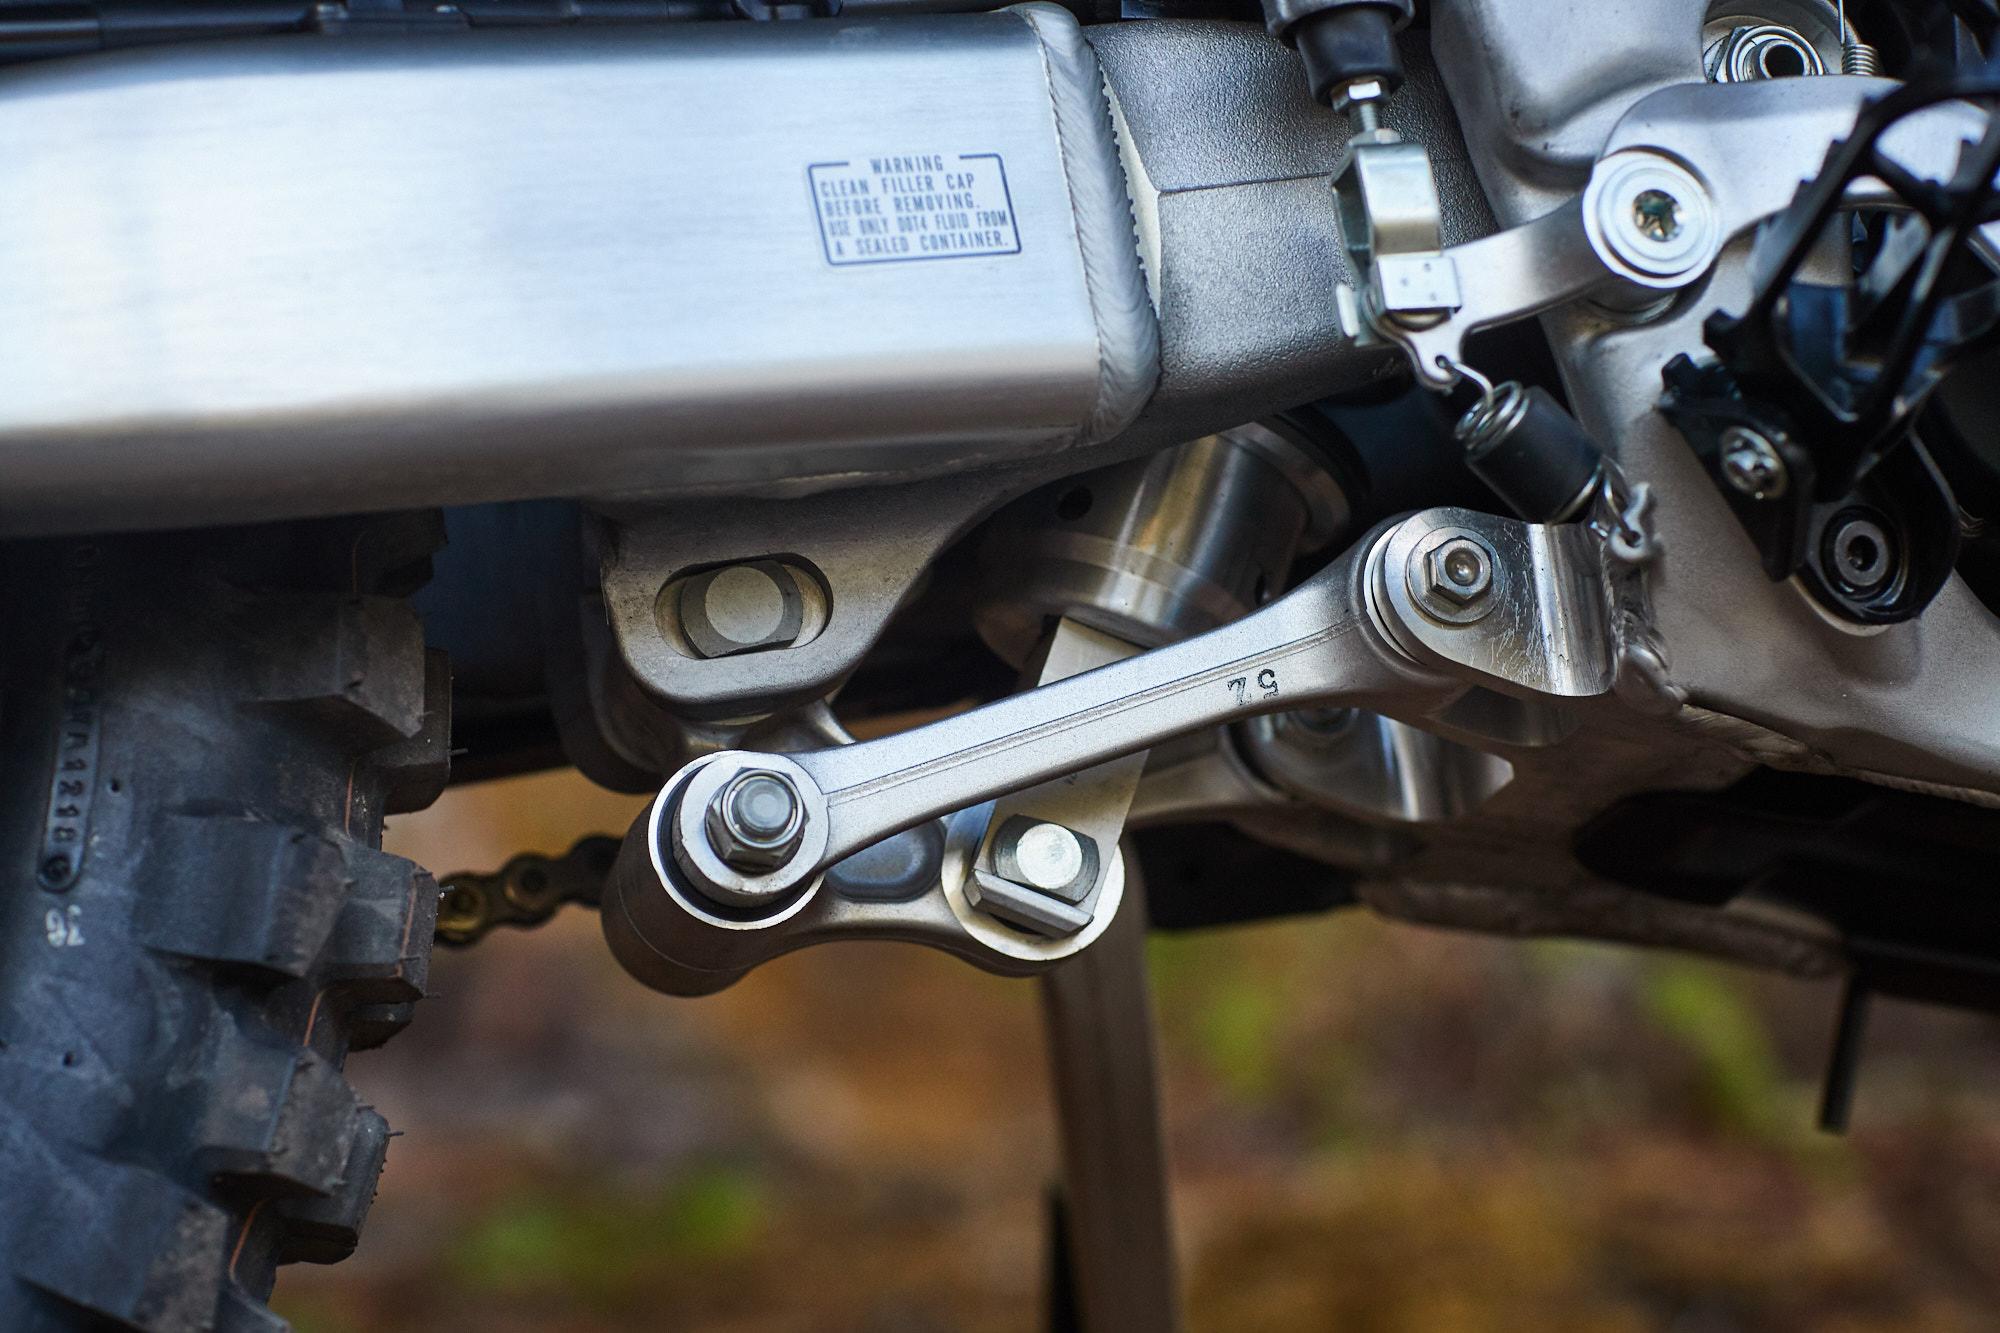 2019 Honda CRF450L first ride review - RevZilla